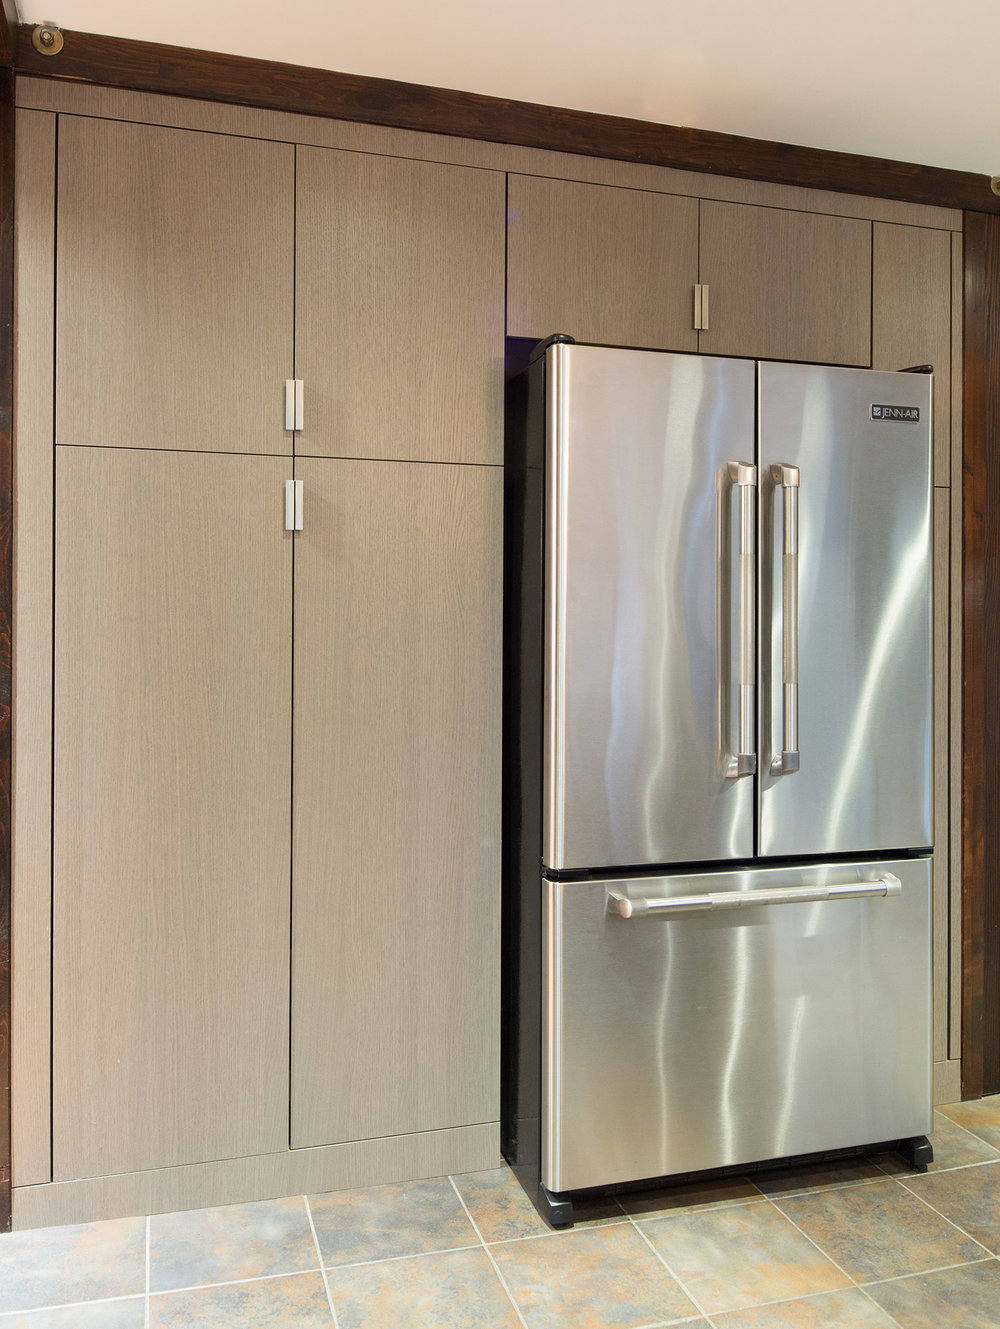 Custom kitchen cabinetry surrounding a refrigerator in grey oak Shinoki